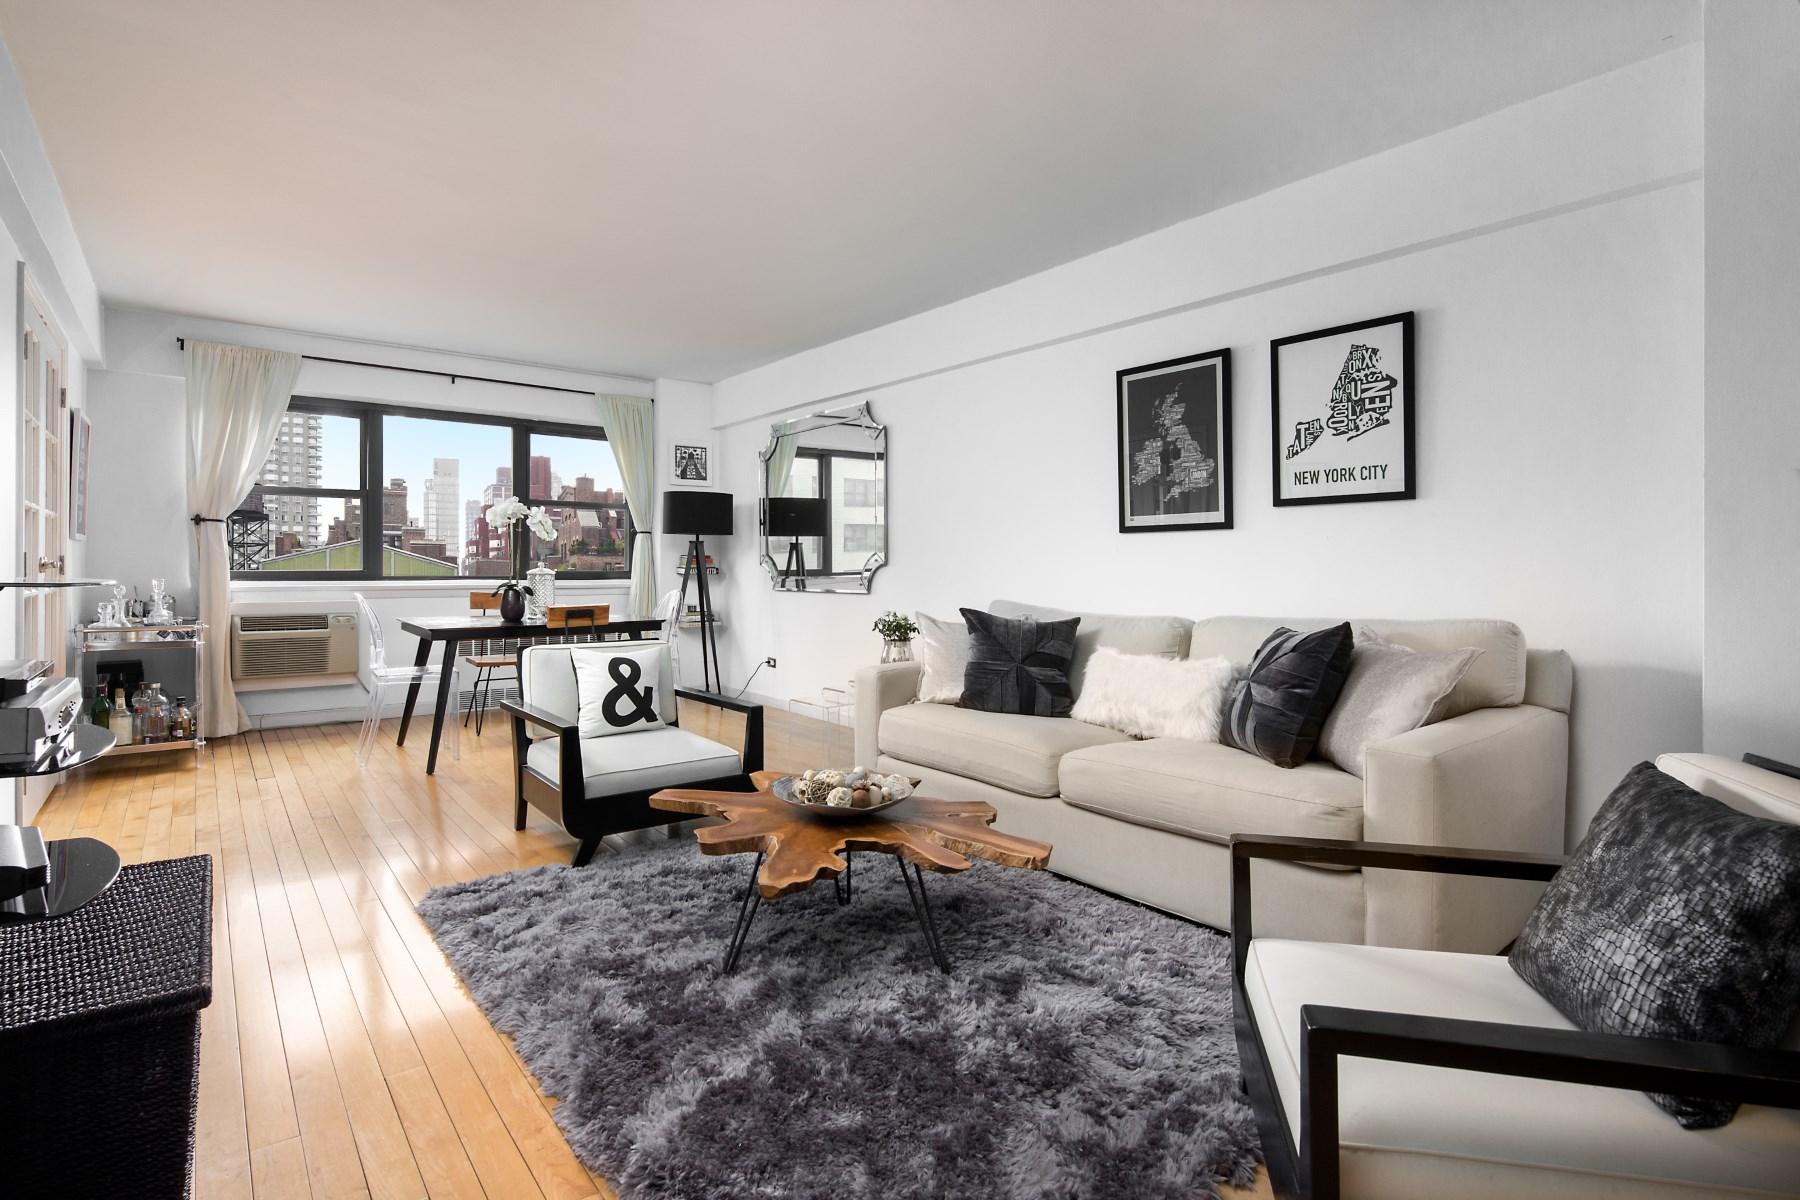 合作公寓 为 销售 在 181 East 73rd Street 181 East 73rd Street Apt 9c Upper East Side, New York, 纽约州 10021 美国